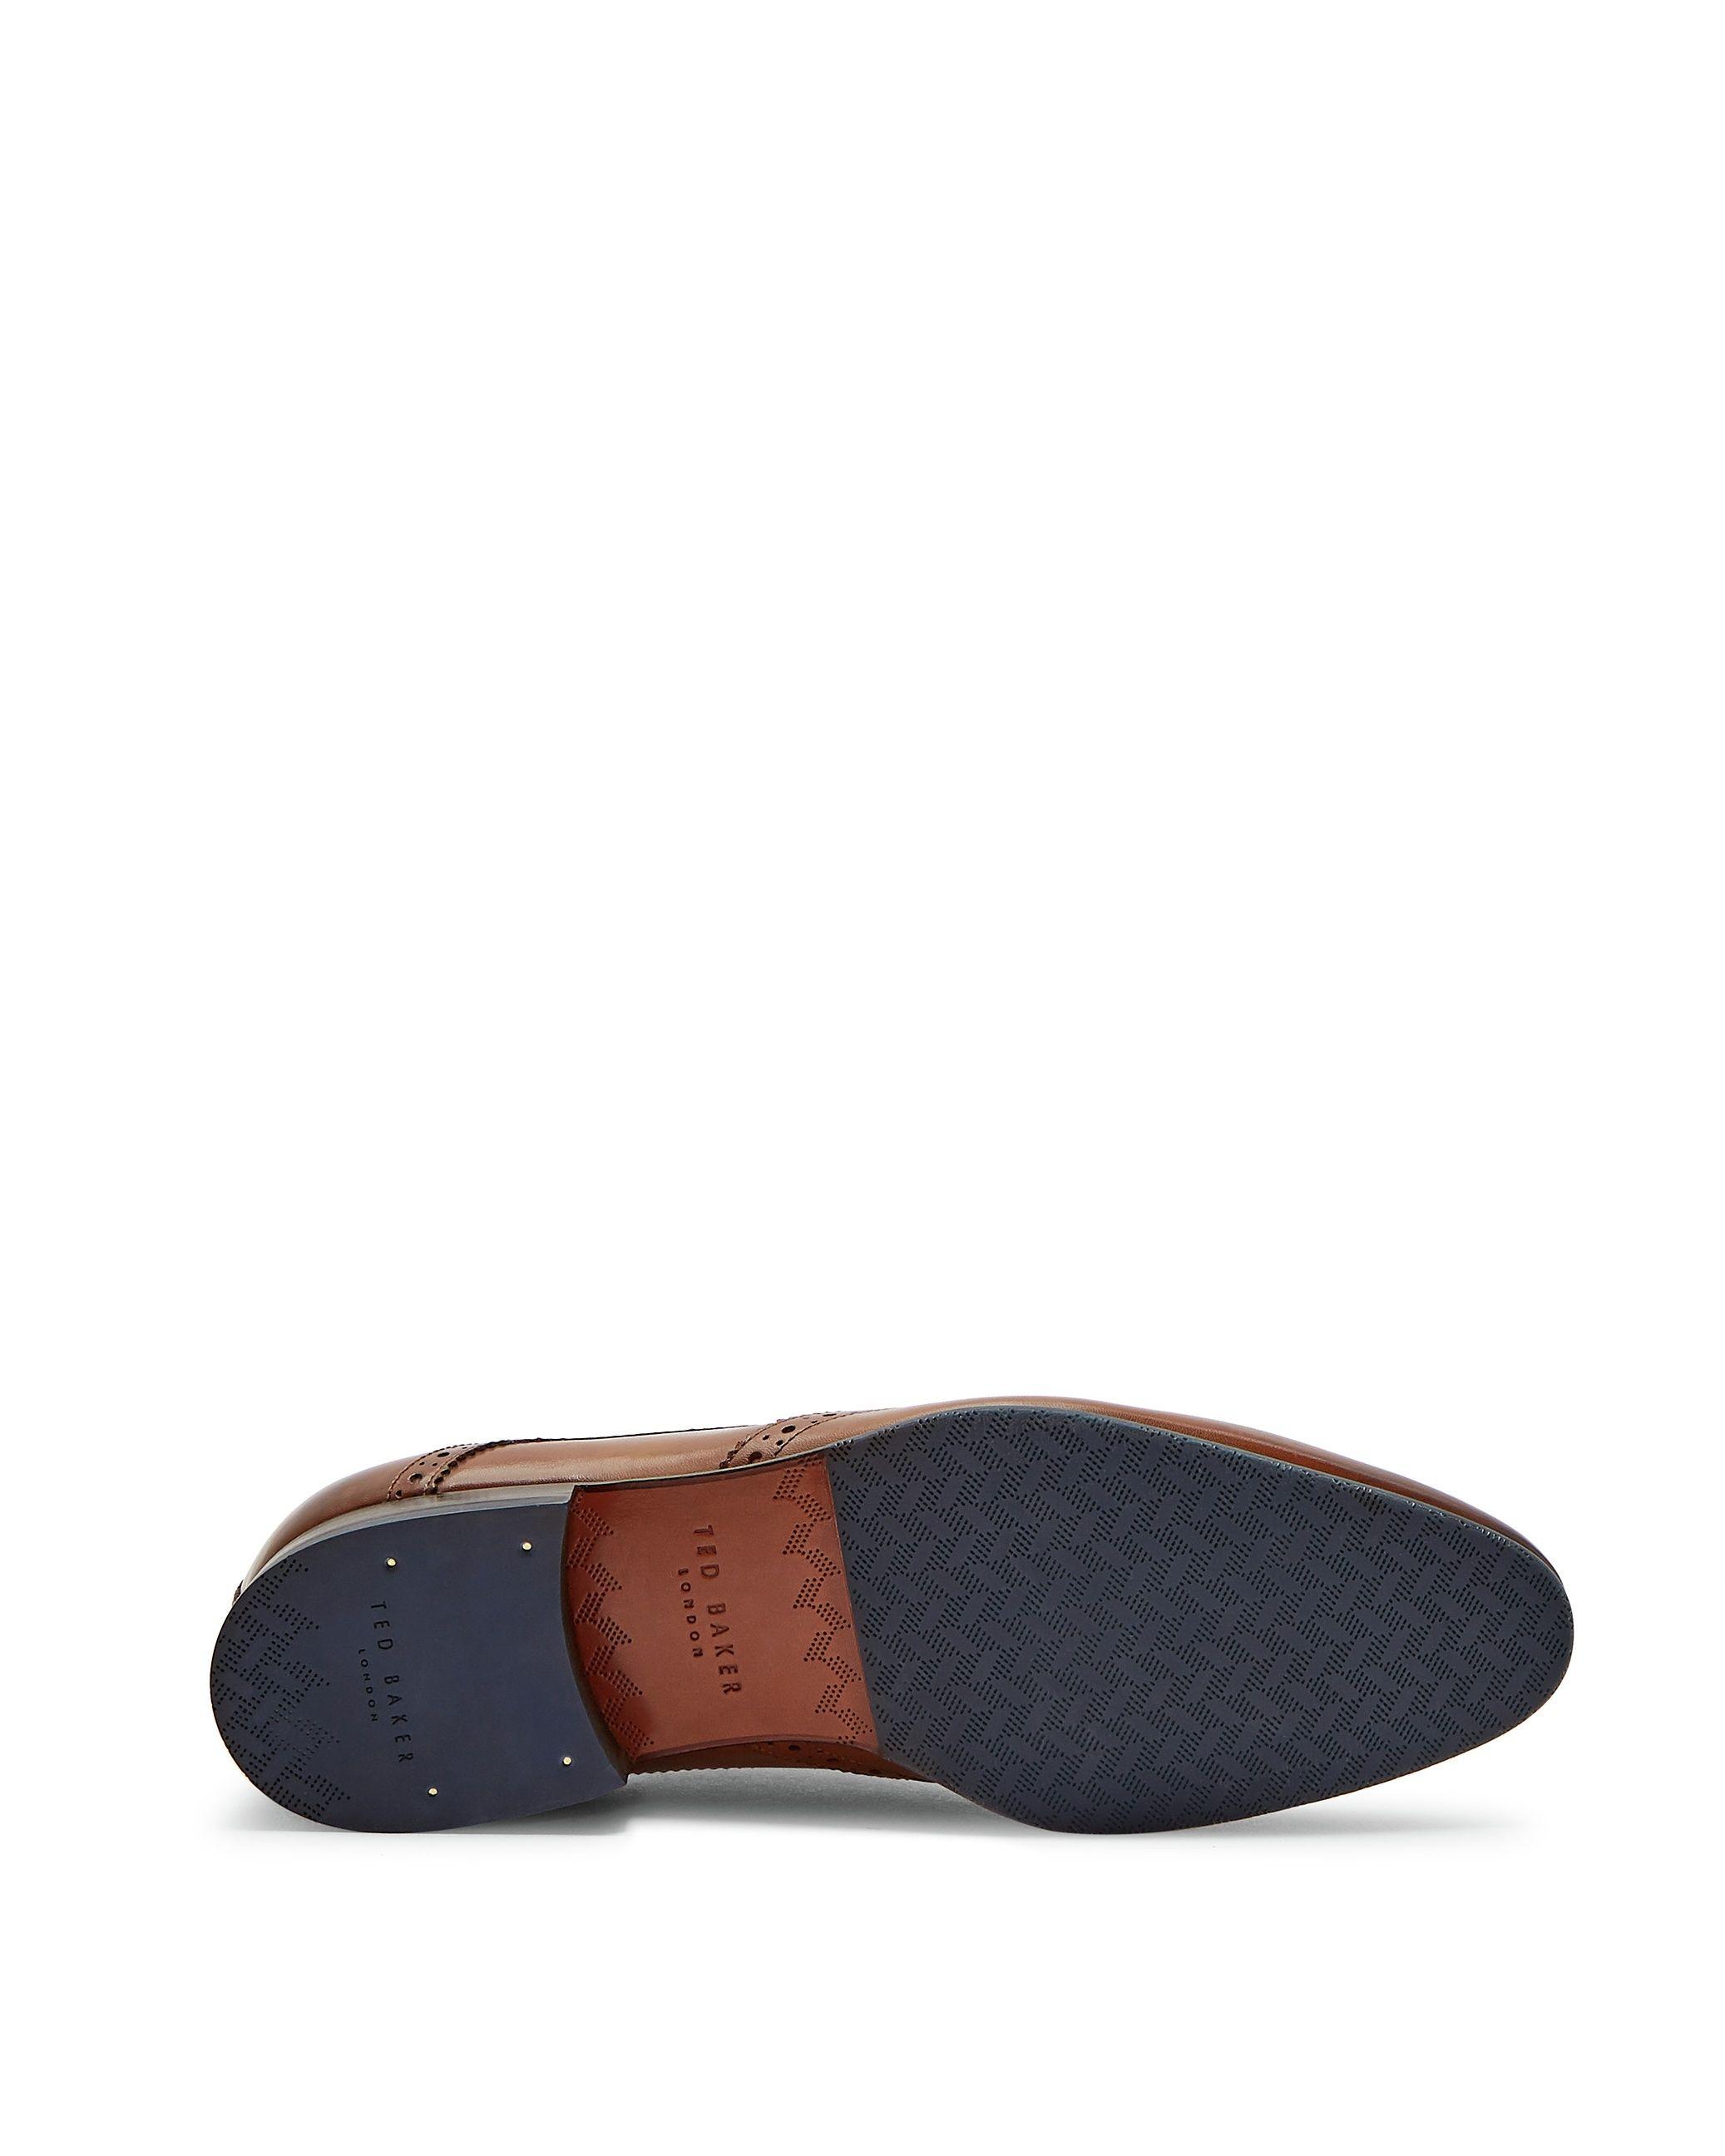 Ted Baker Hosei Leather Wing Cap Brogues, Tan